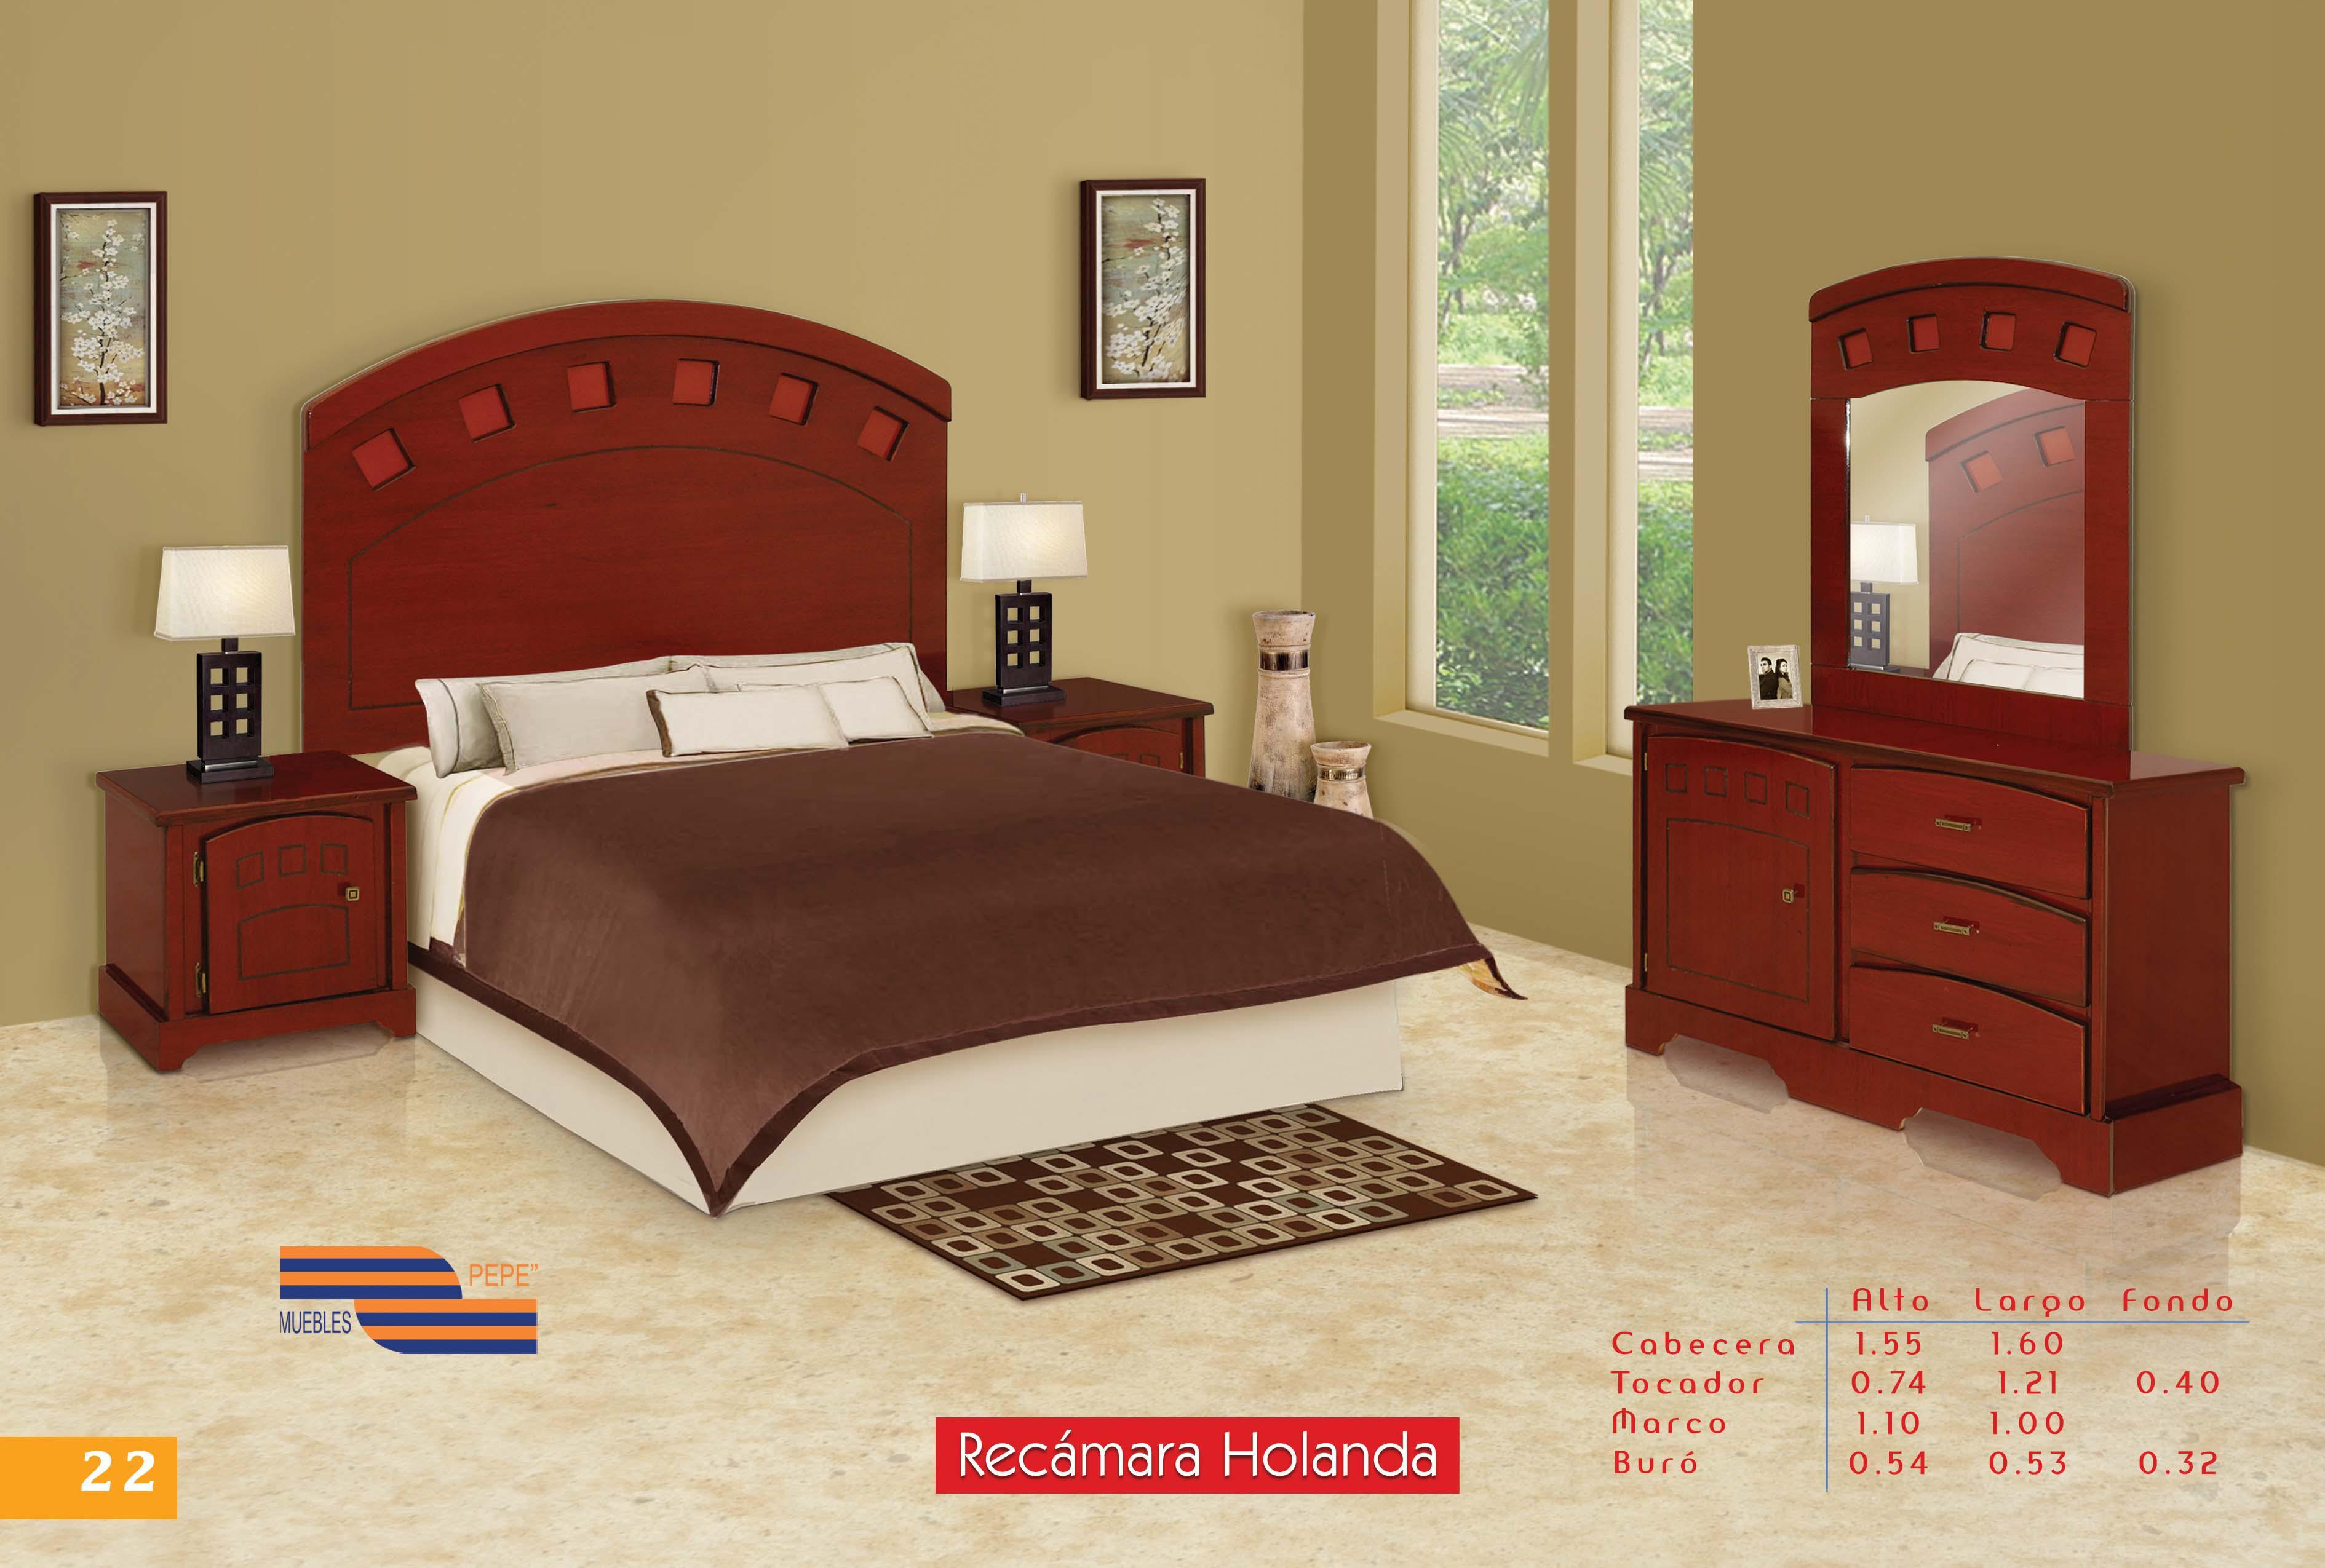 Muebles troncoso recamaras matrimoniales 20170714002103 for Recamaras de madera en monterrey